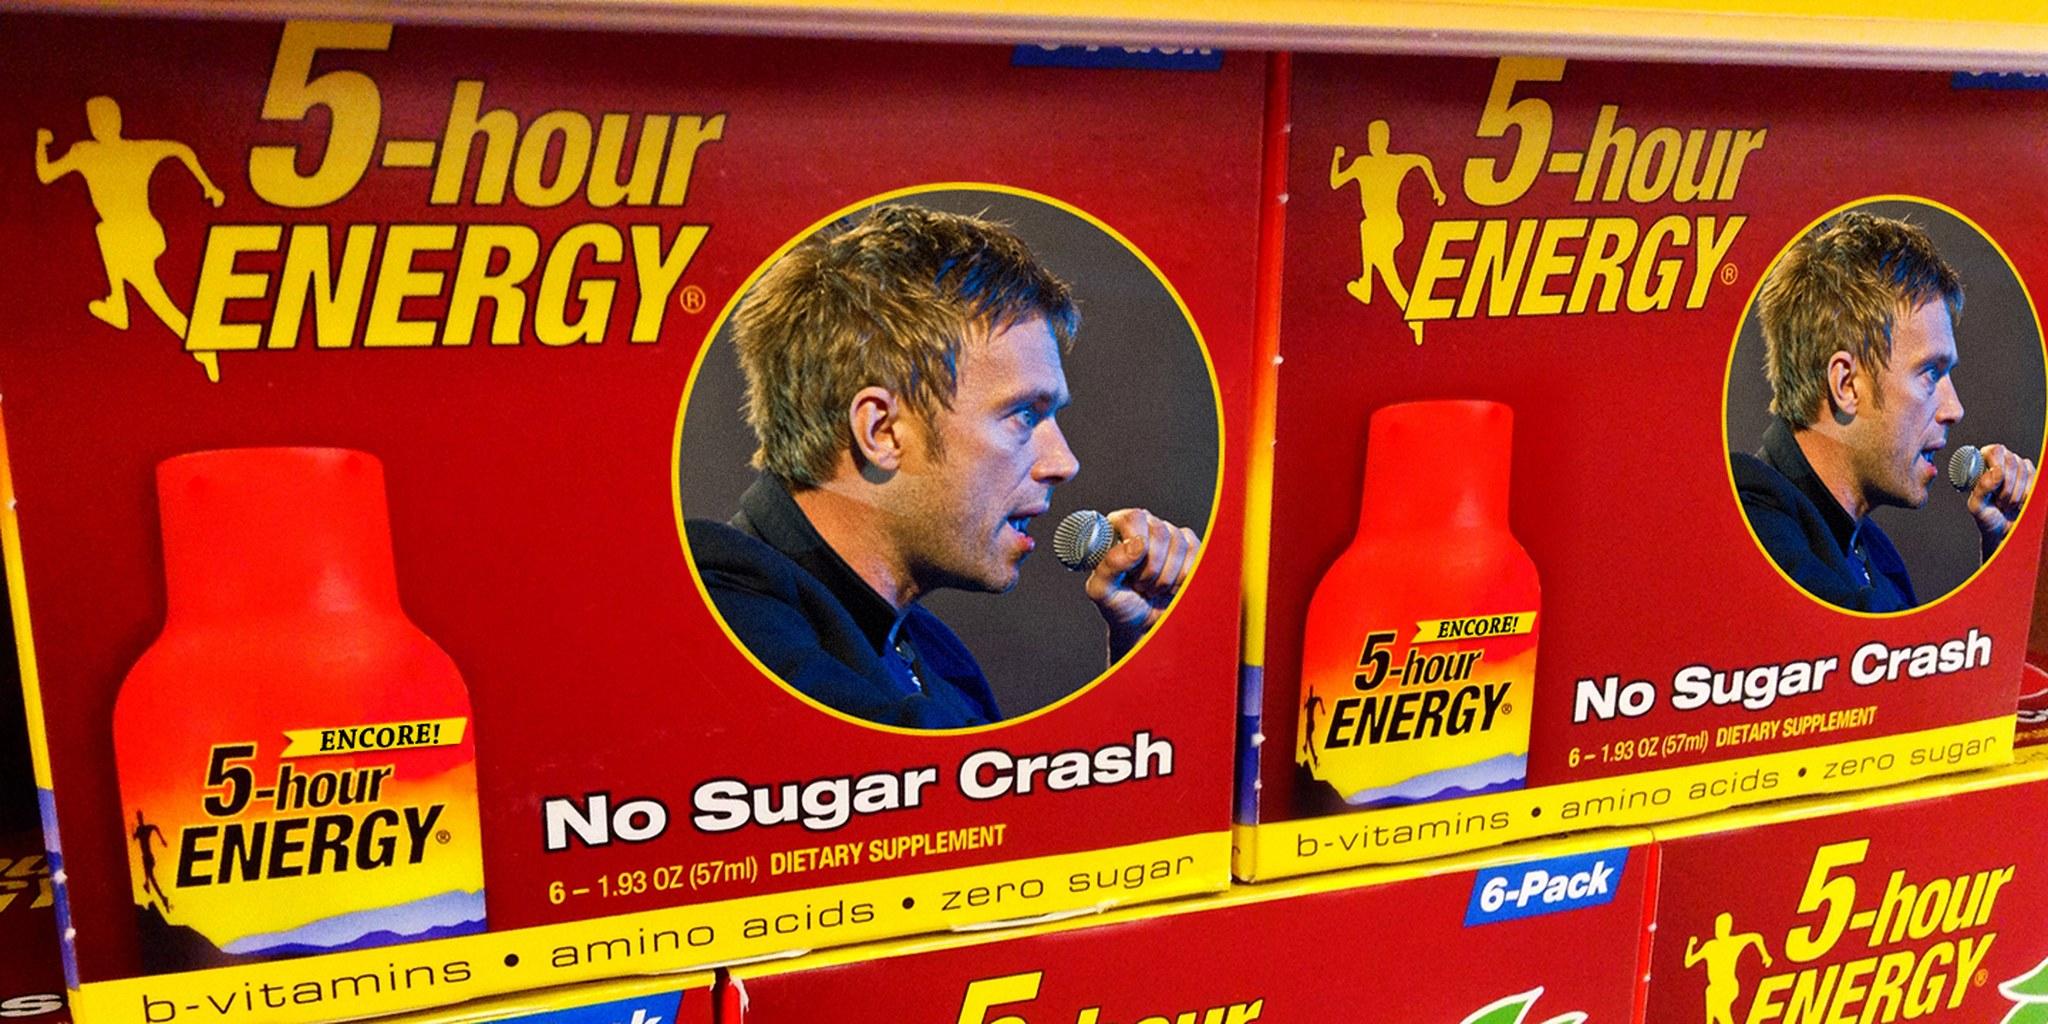 Blur lead singer on 5-hour energy box